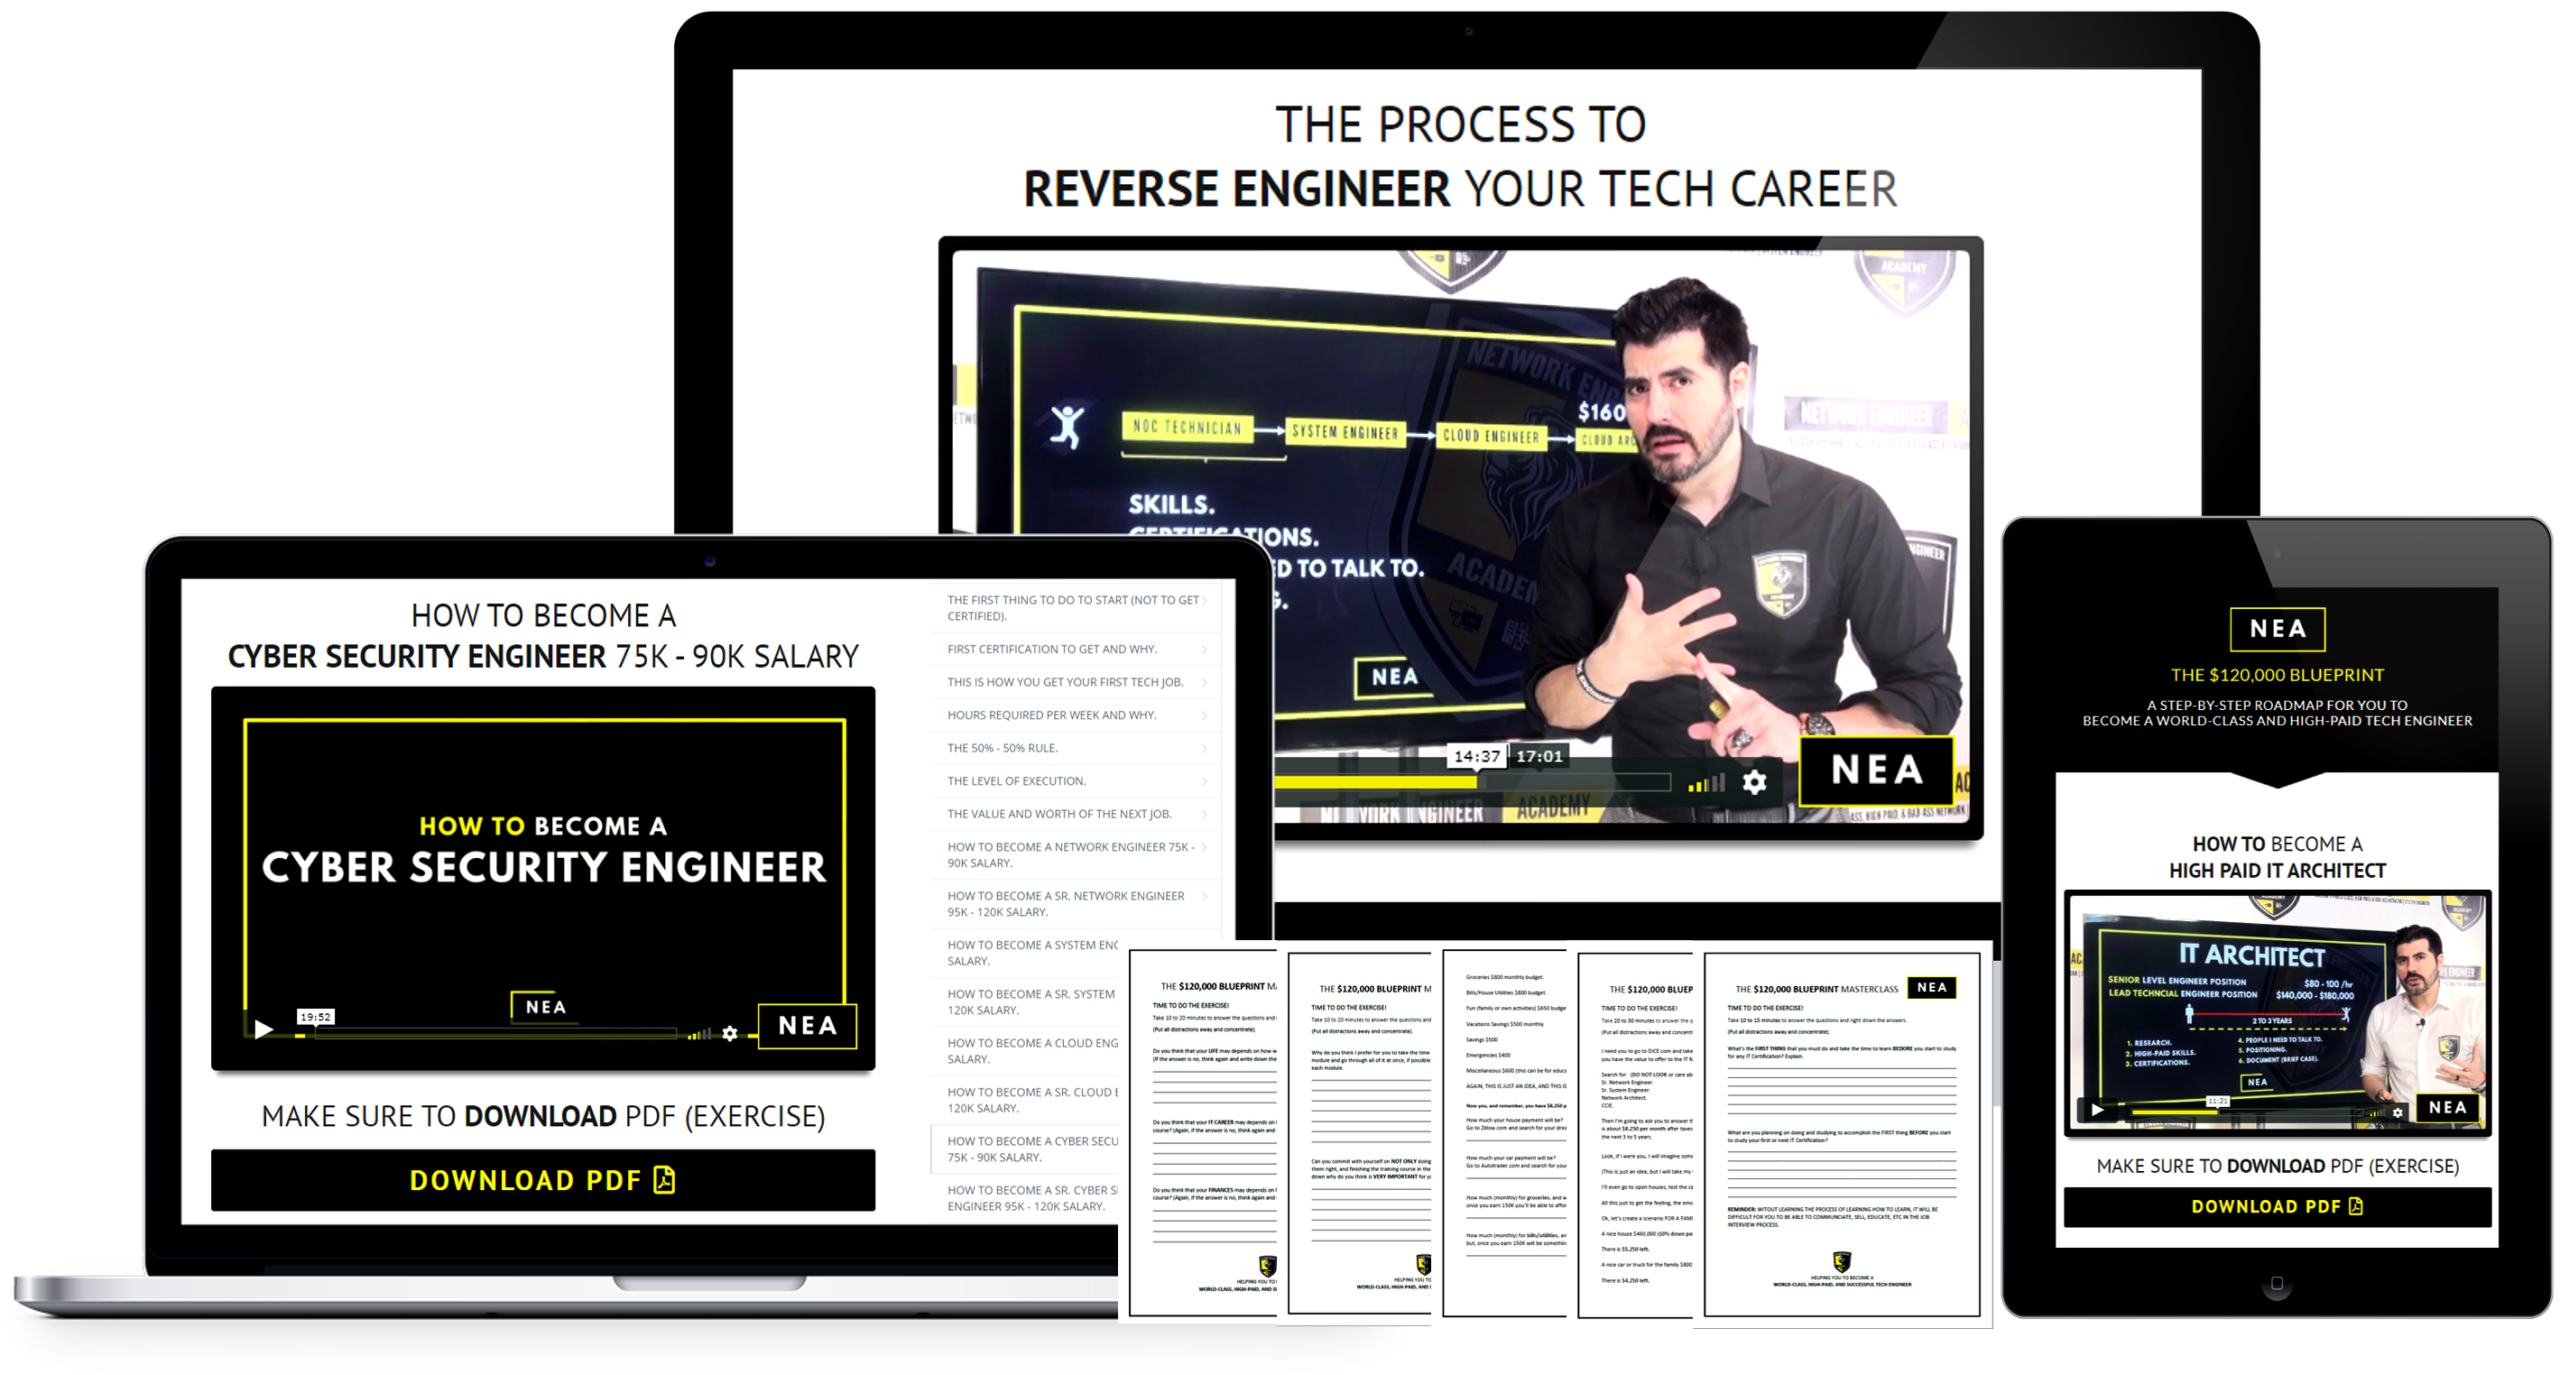 NEA Network Engineer Academy 120K Blueprint